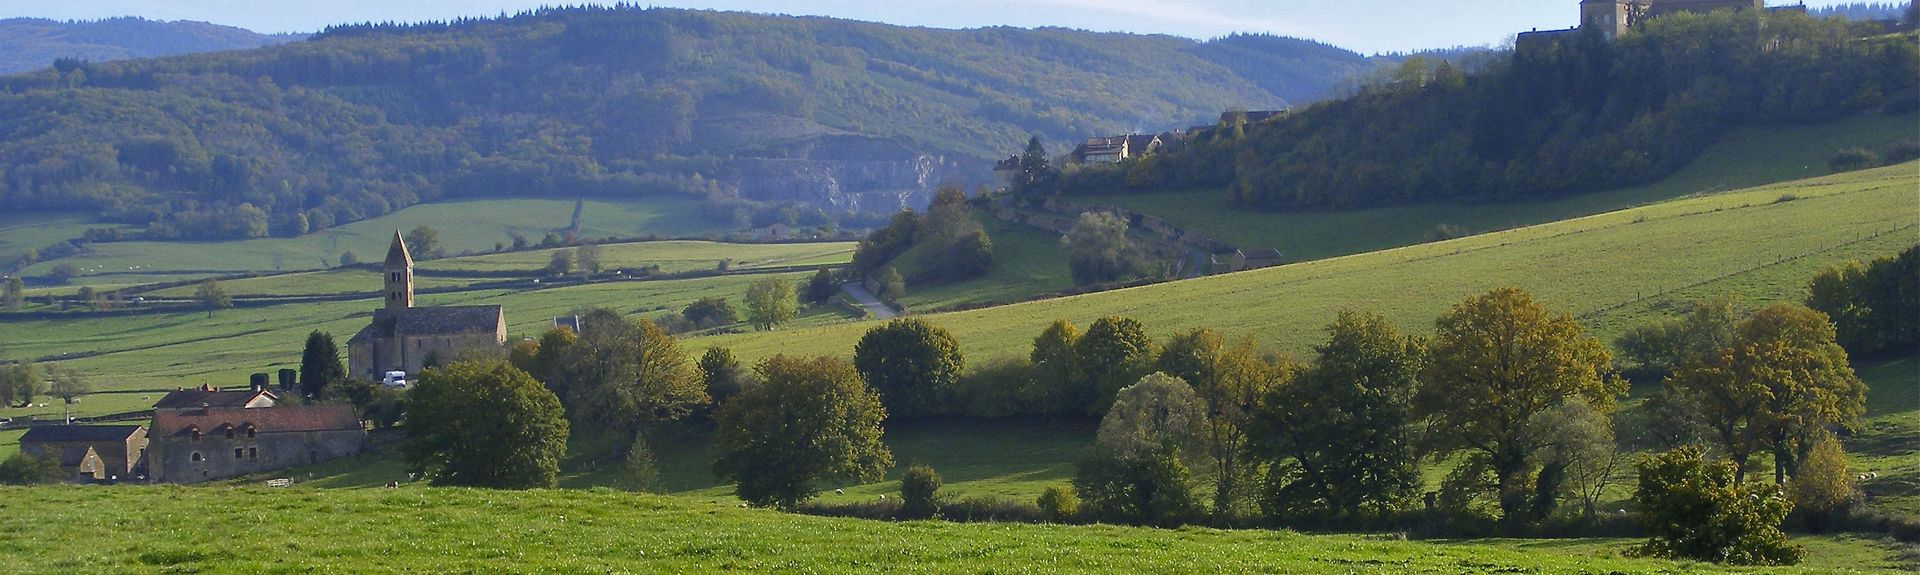 Cluny, Saone-et-Loire (departementti), Ranska